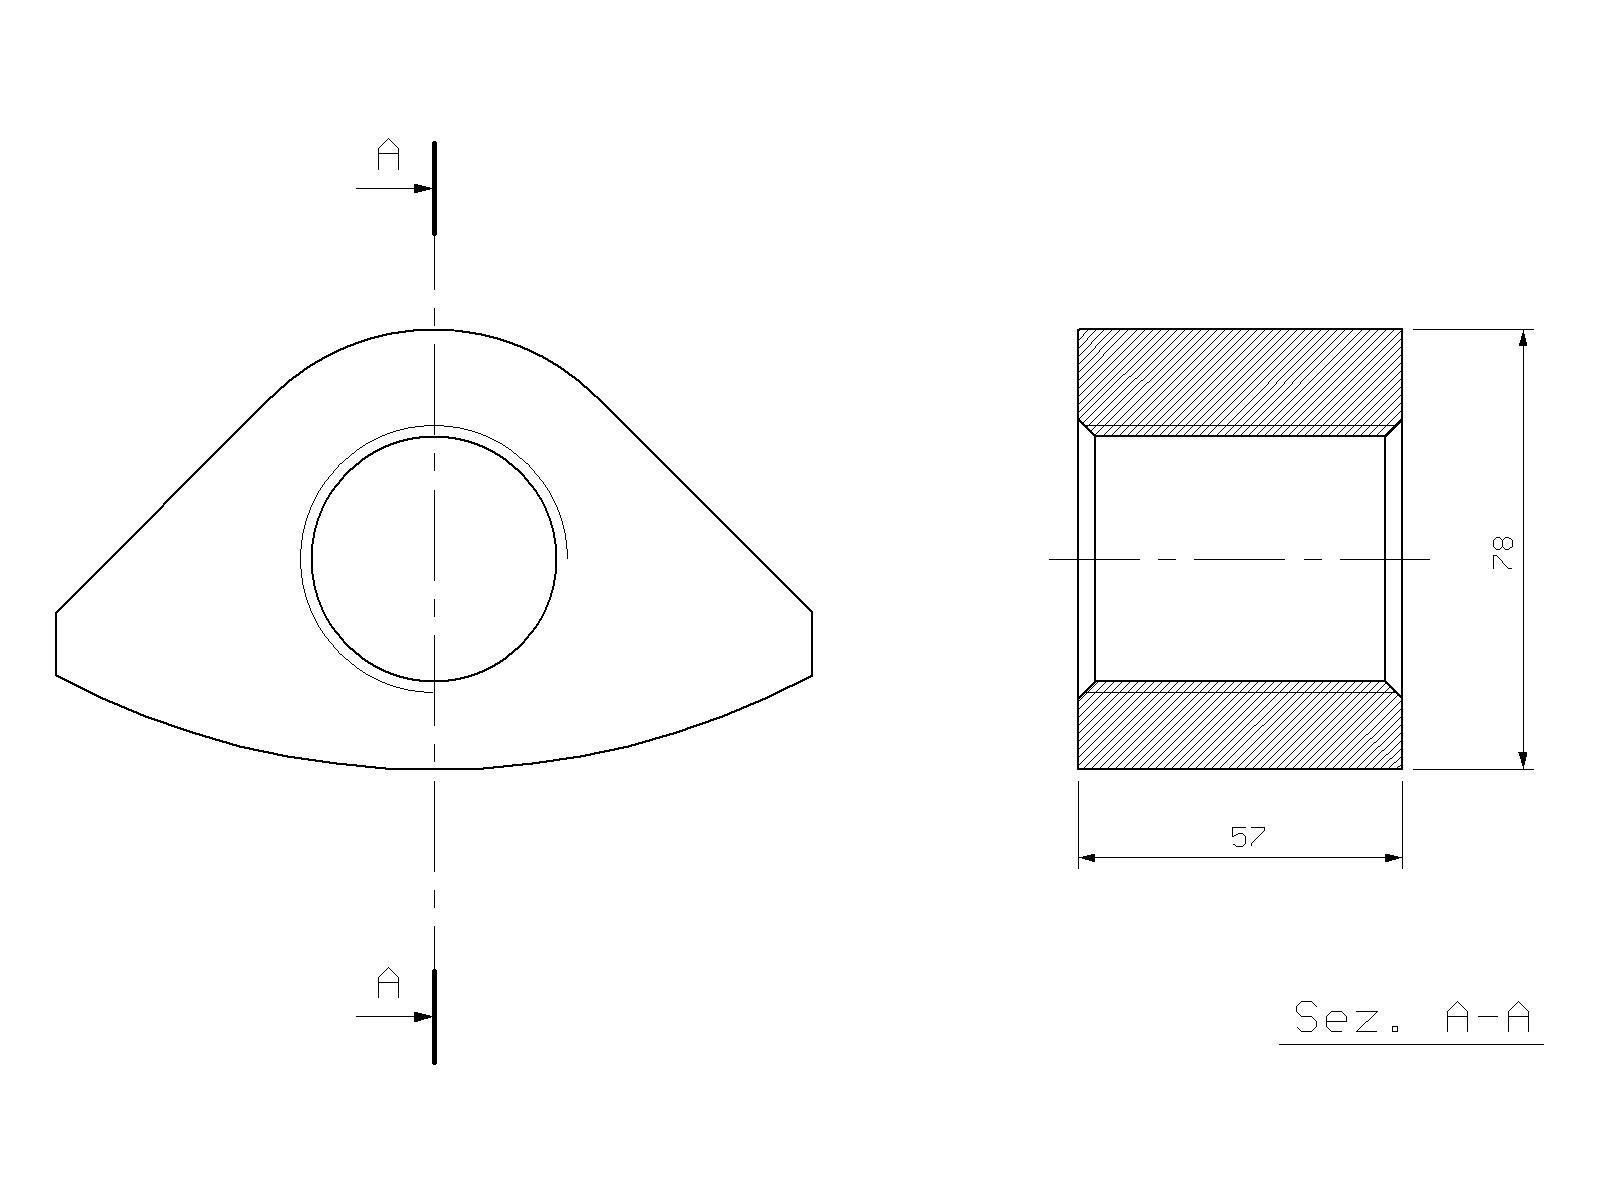 Nut for tensioning bolt, KRUPP, HM 2000, hydraulic hammer